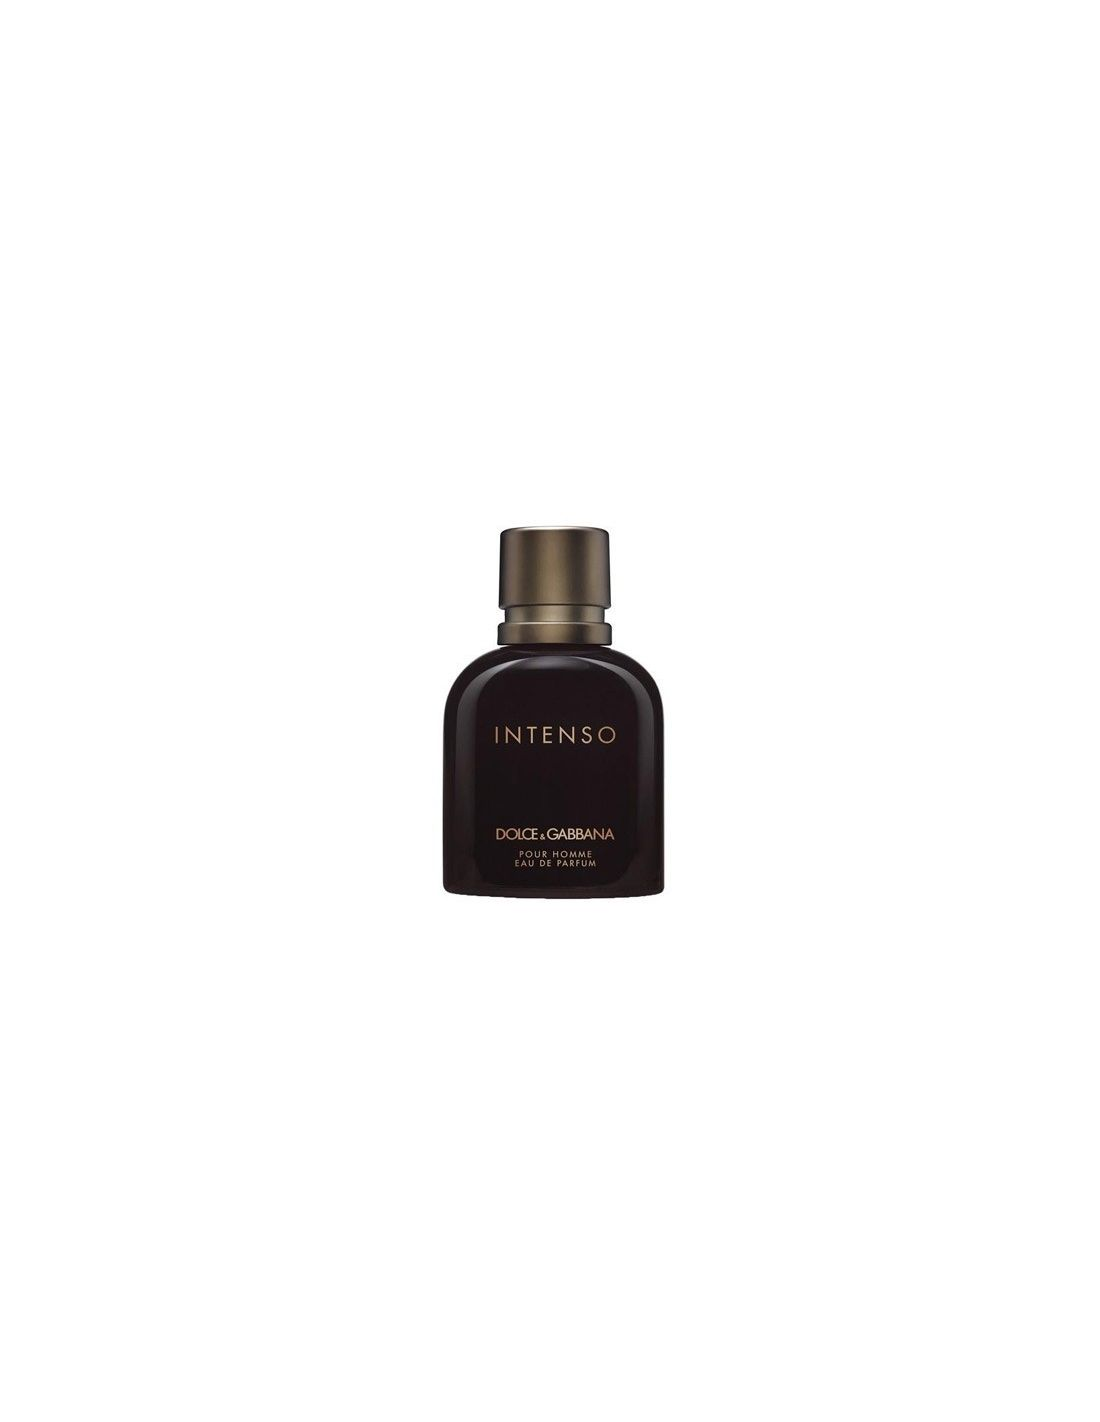 7baacea8361a1 Dolce   Gabbana Intenso Eau de Parfum 200 ml Perfumes 24 ...